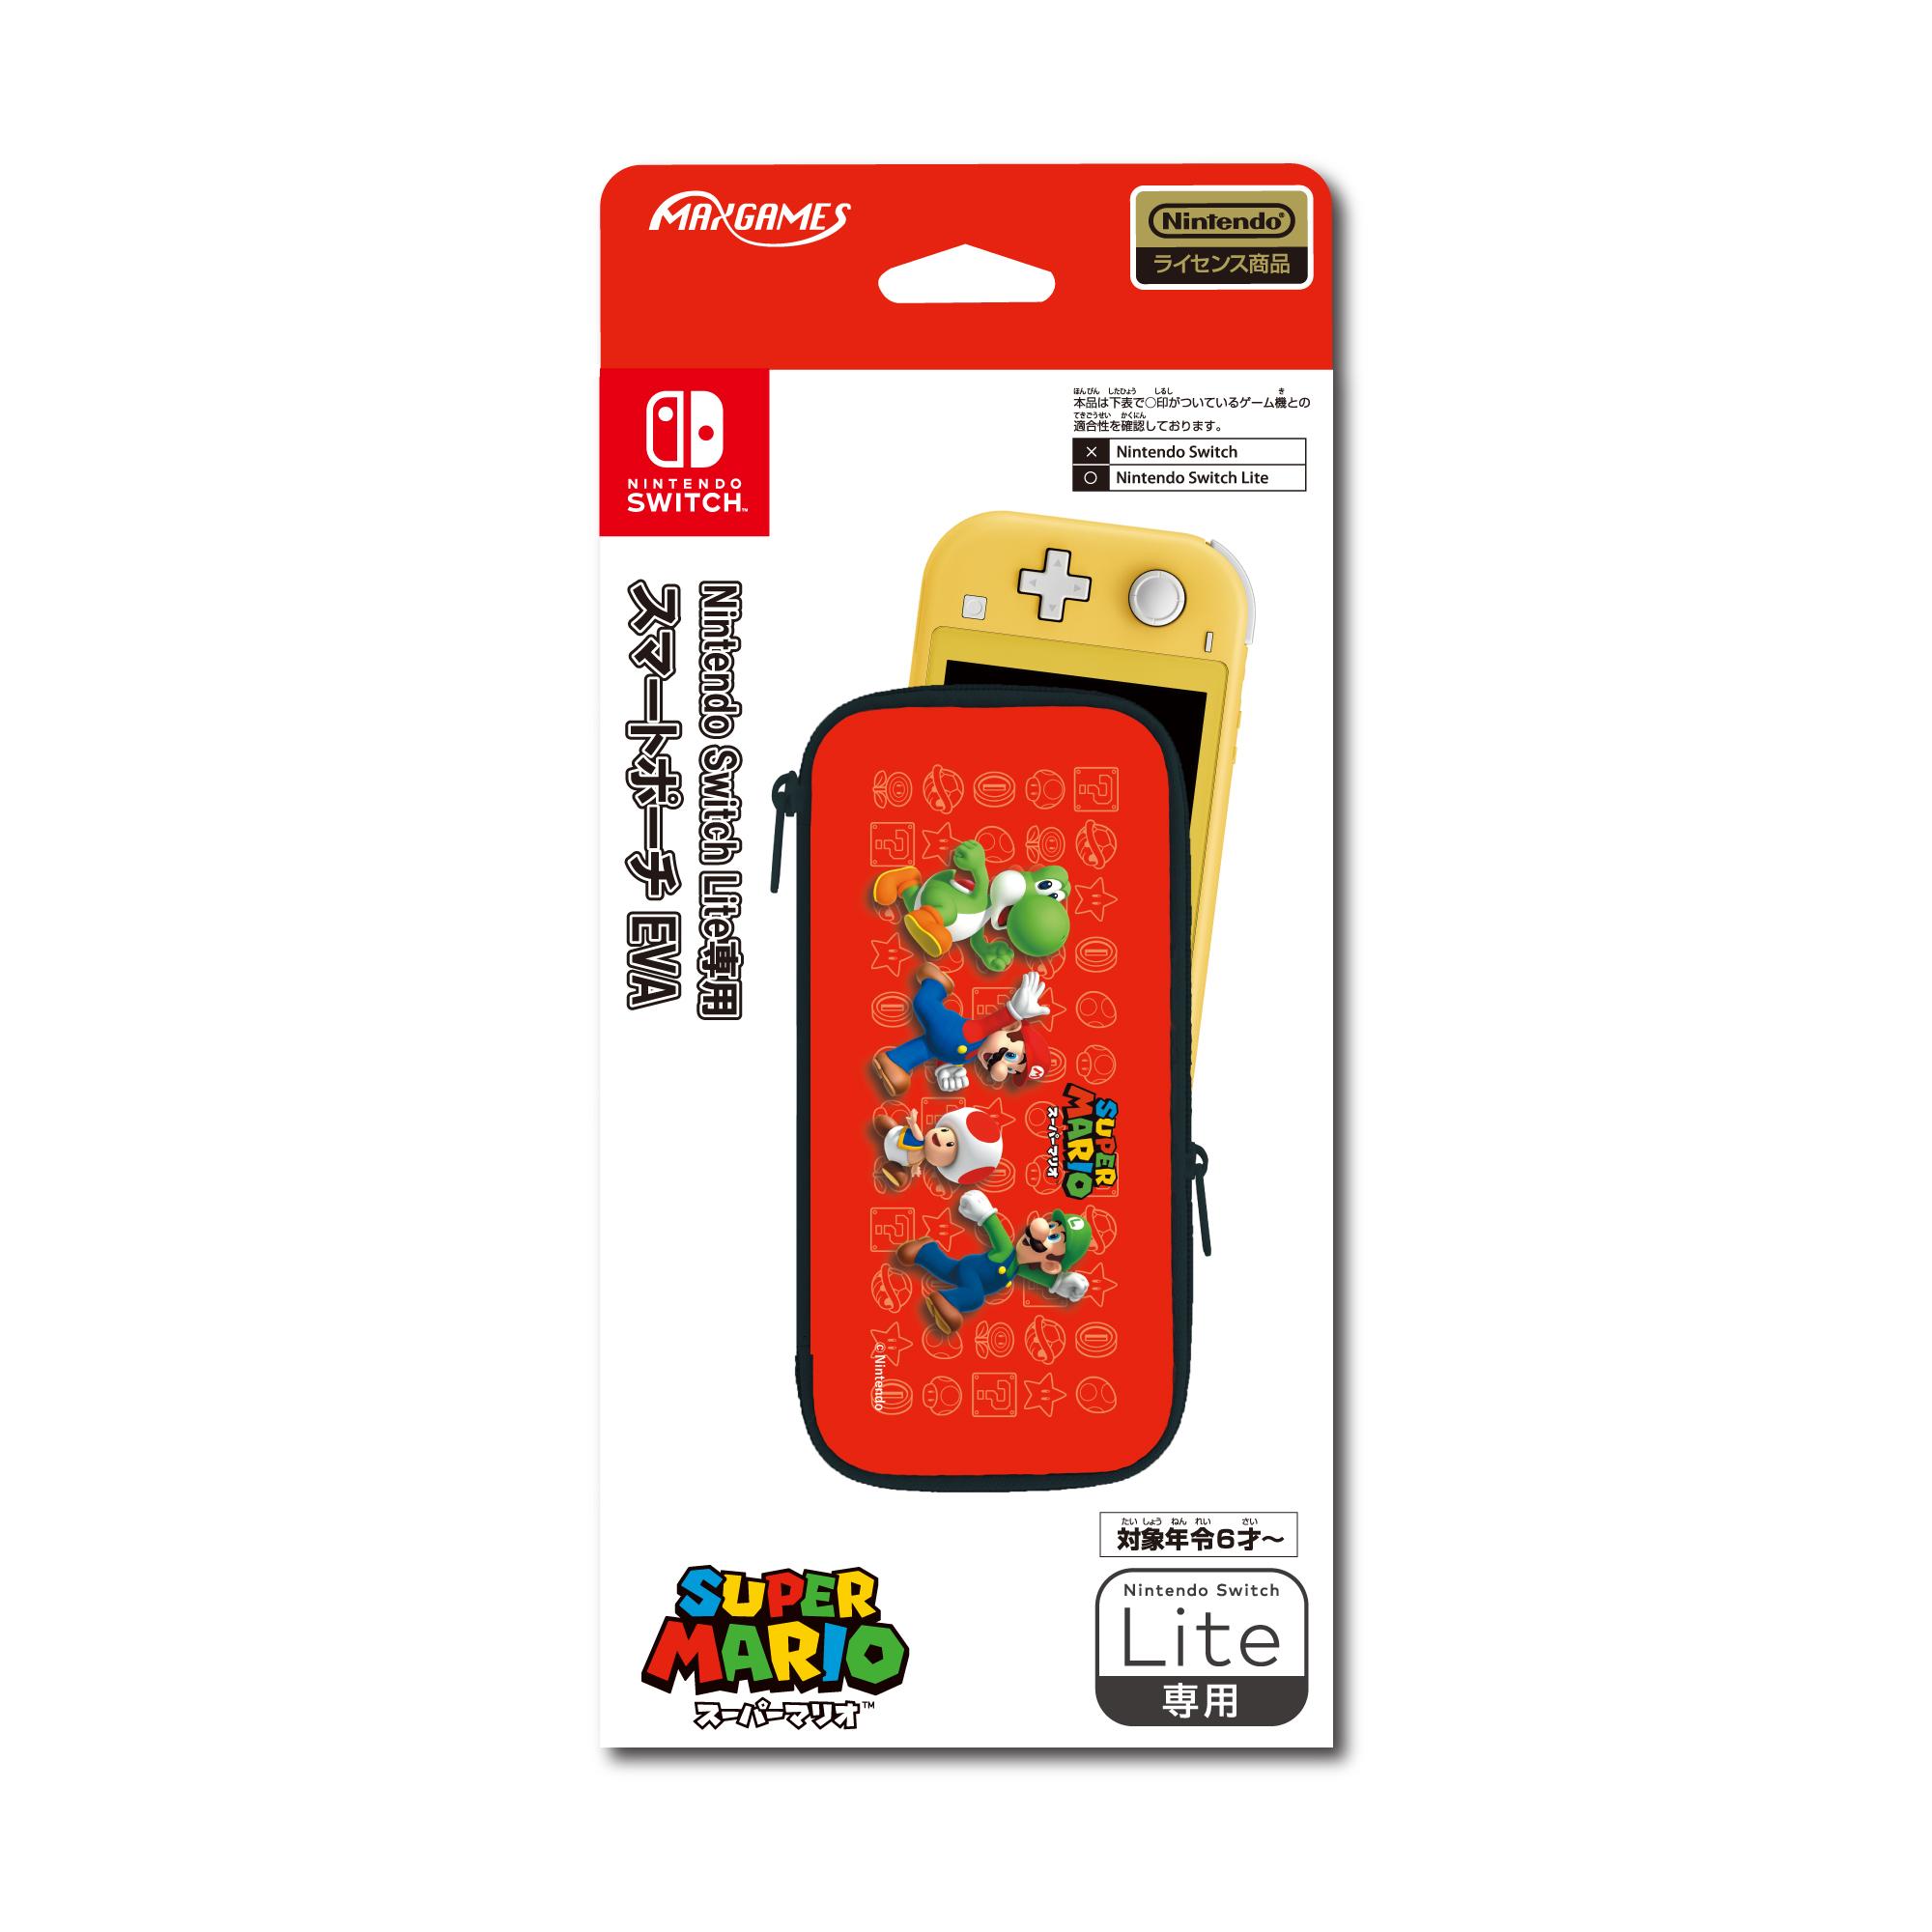 Nintendo Switch Lite専用<br>スマートポーチEVA<br>スーパーマリオ